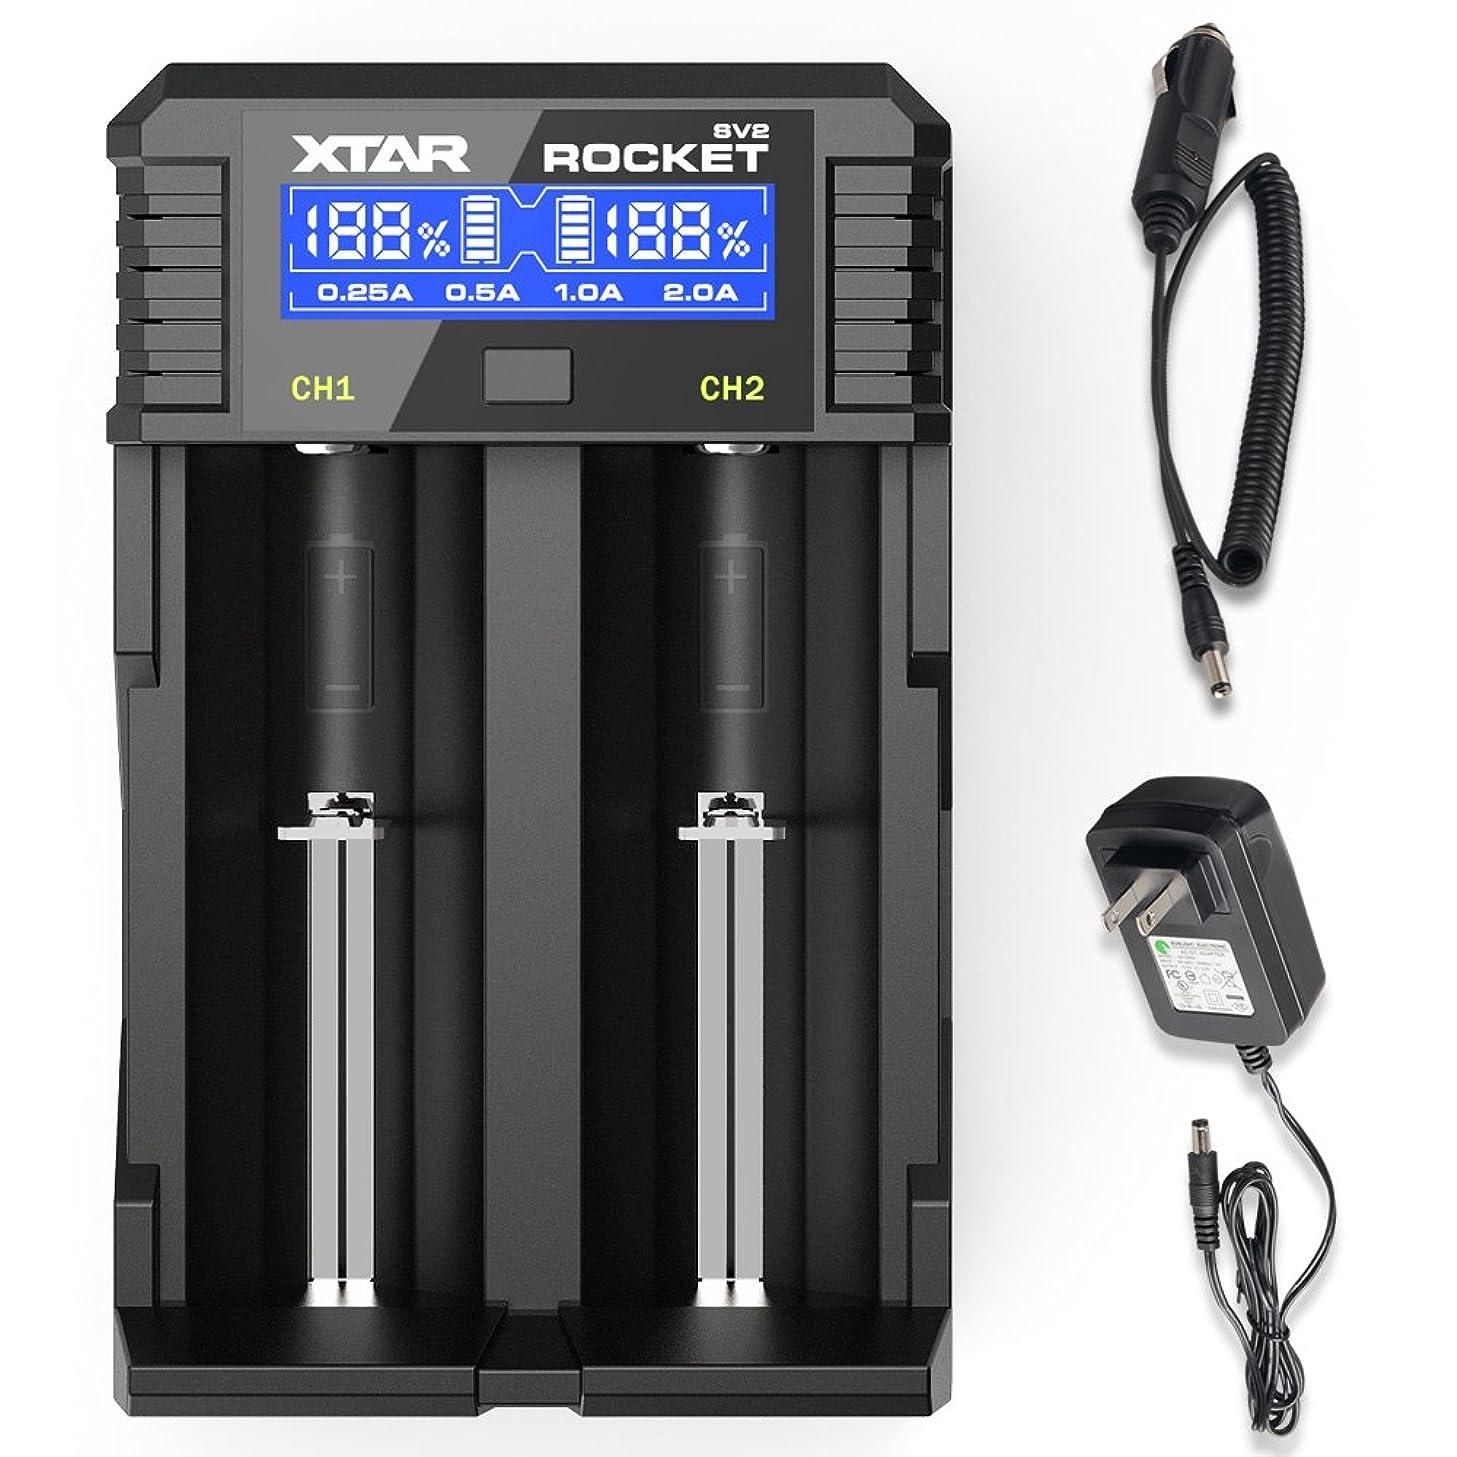 18650 Smart Fast Battery Charger, XTAR SV2 Universal Battery Charger Wall Adaptor & Car Charger Rechargeable Li-ion IMR INR ICR 18650 26650 20700 21700 22650, Ni-MH/Ni-Cd AAAA AAA AA A SC C D